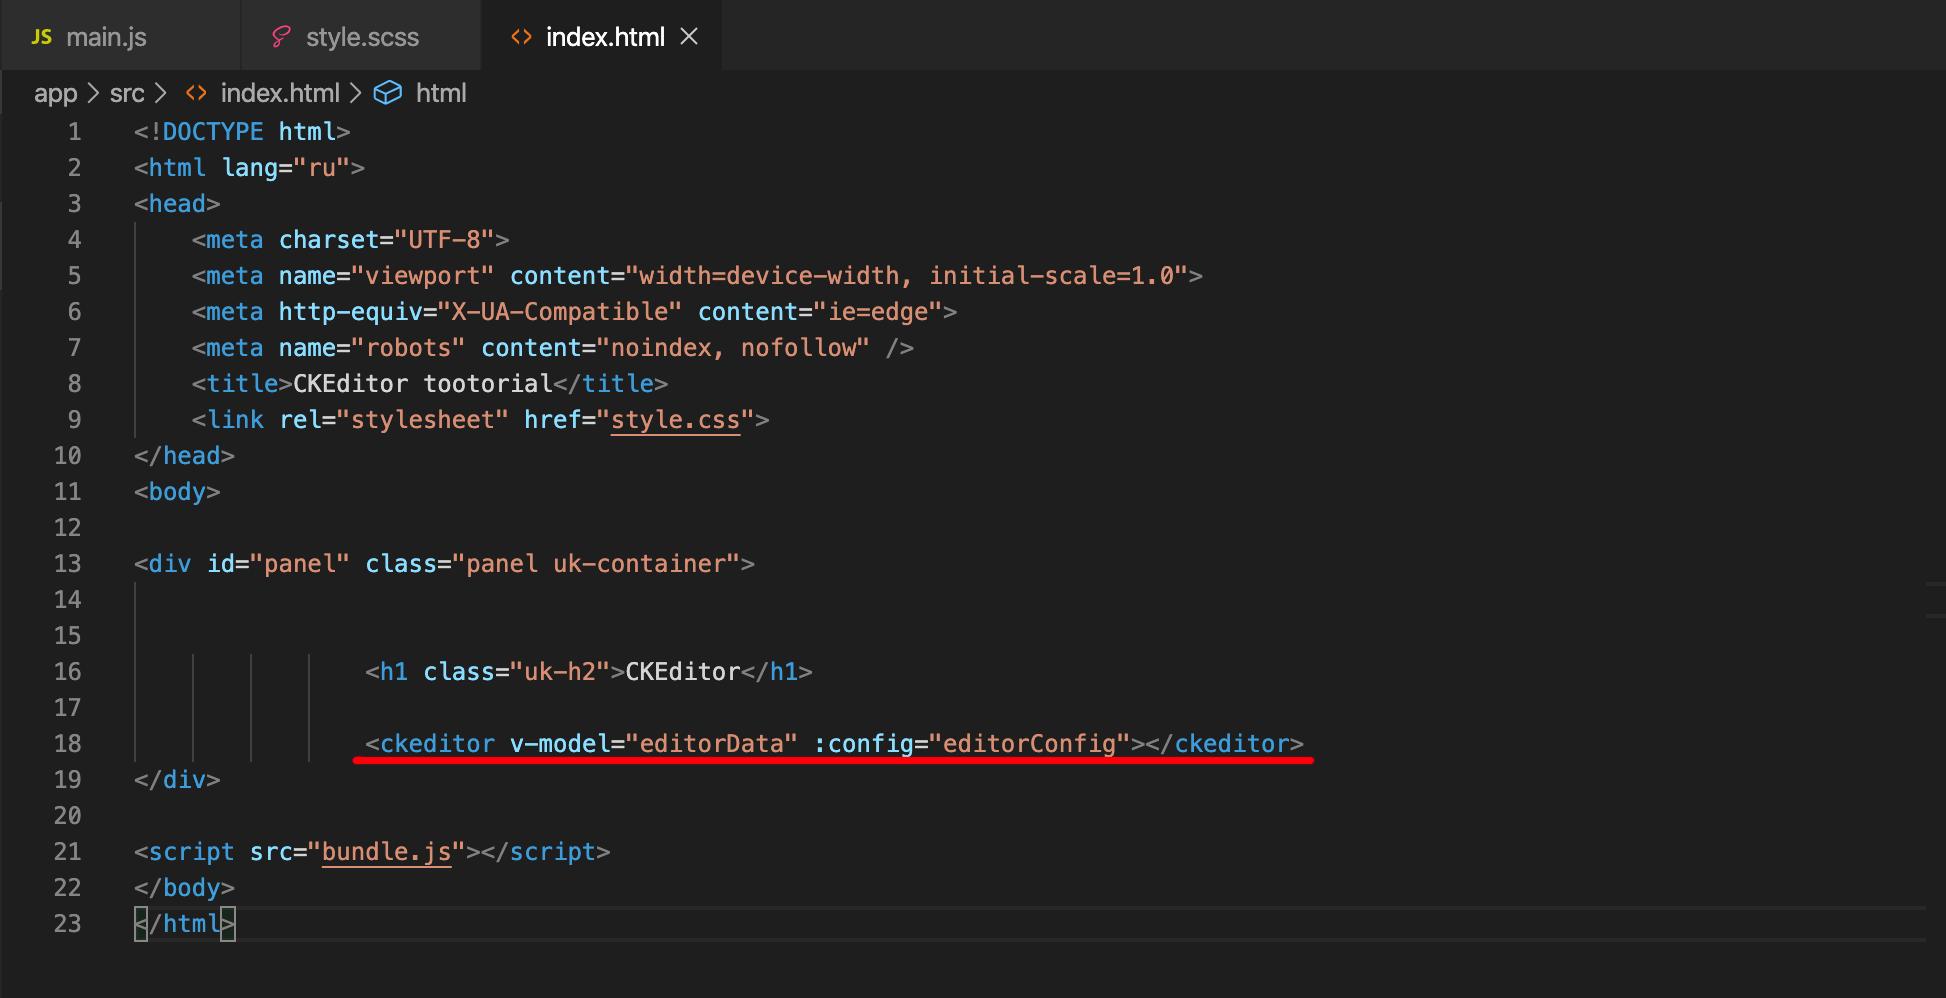 пример html кода от ckeditor 4 для vue компонента